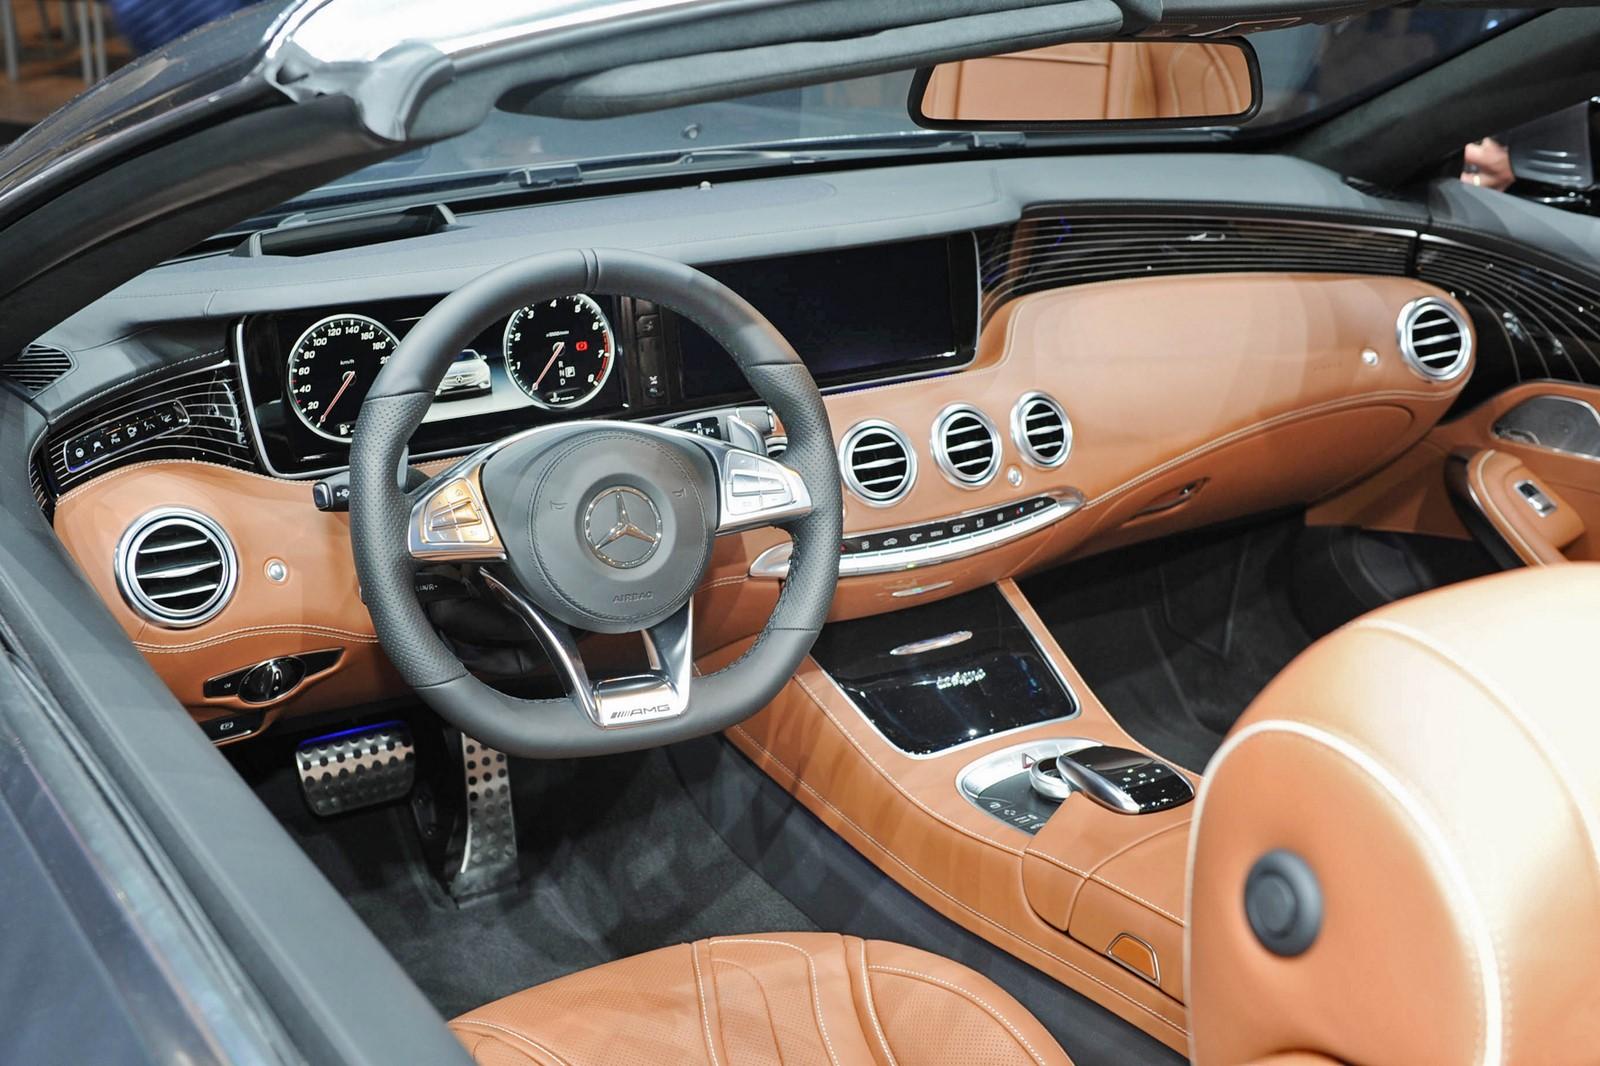 2015 mercedes s class cabriolet mercedes amg s63. Black Bedroom Furniture Sets. Home Design Ideas